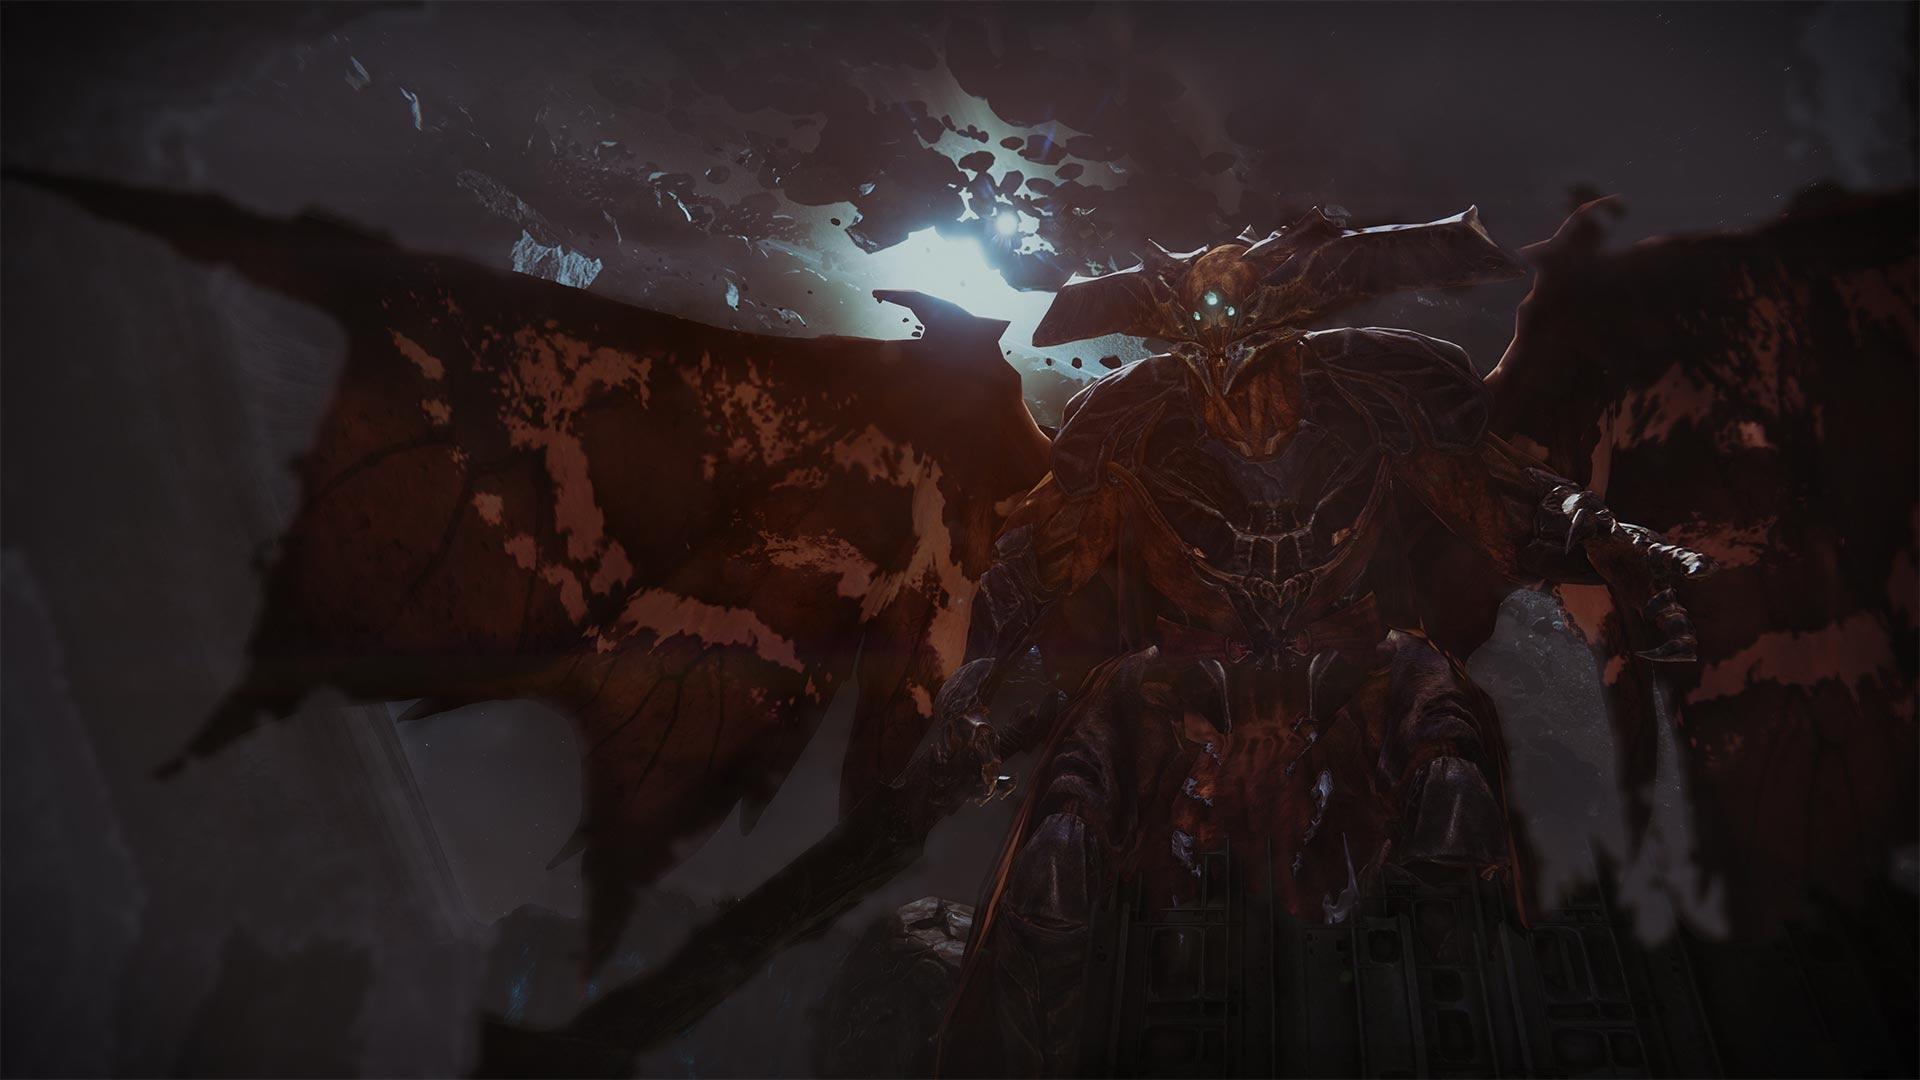 Oryx is the new villain.